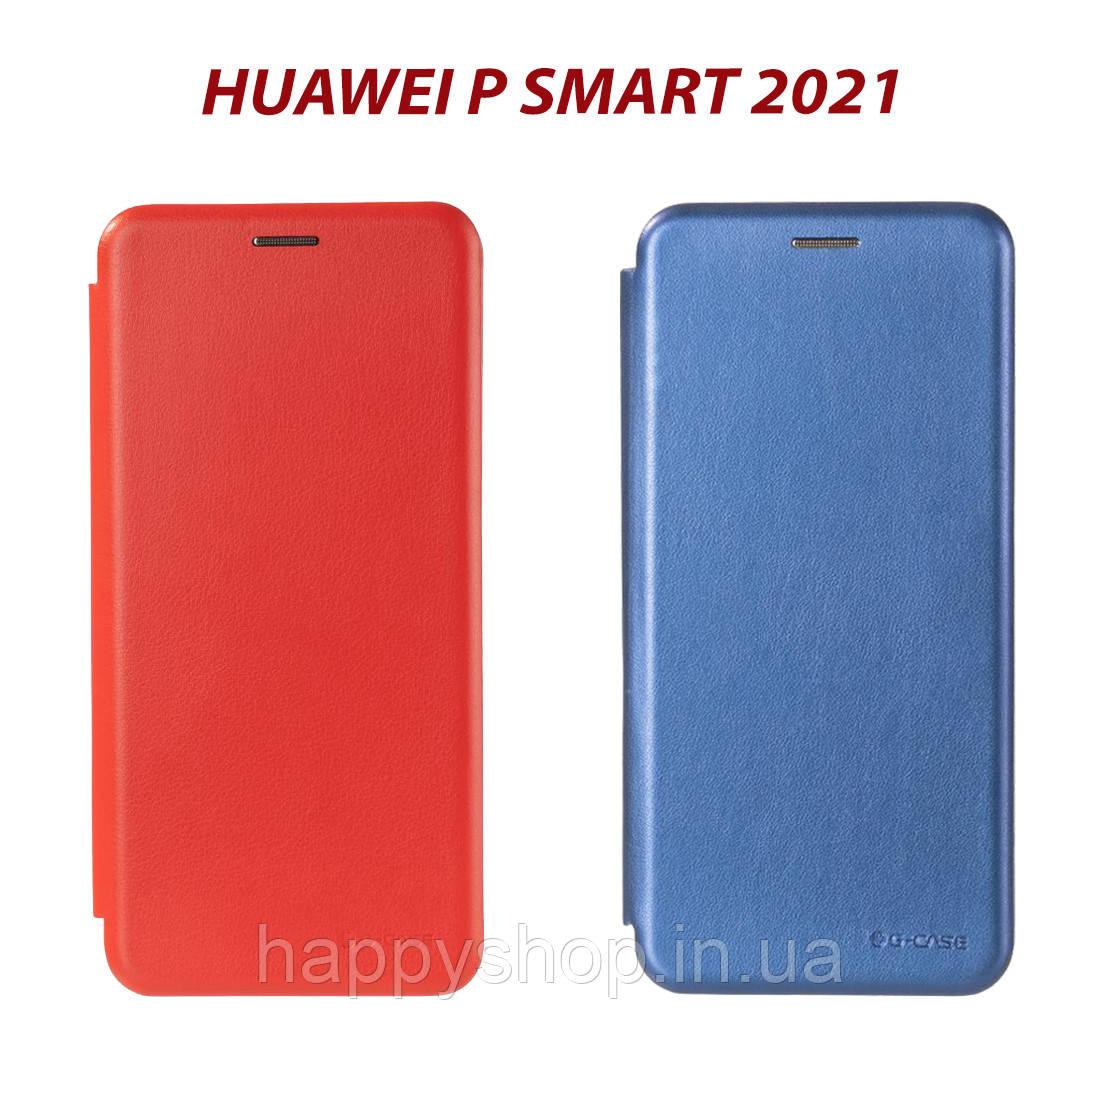 Чохол-книжка G-Case для Huawei P Smart 2021